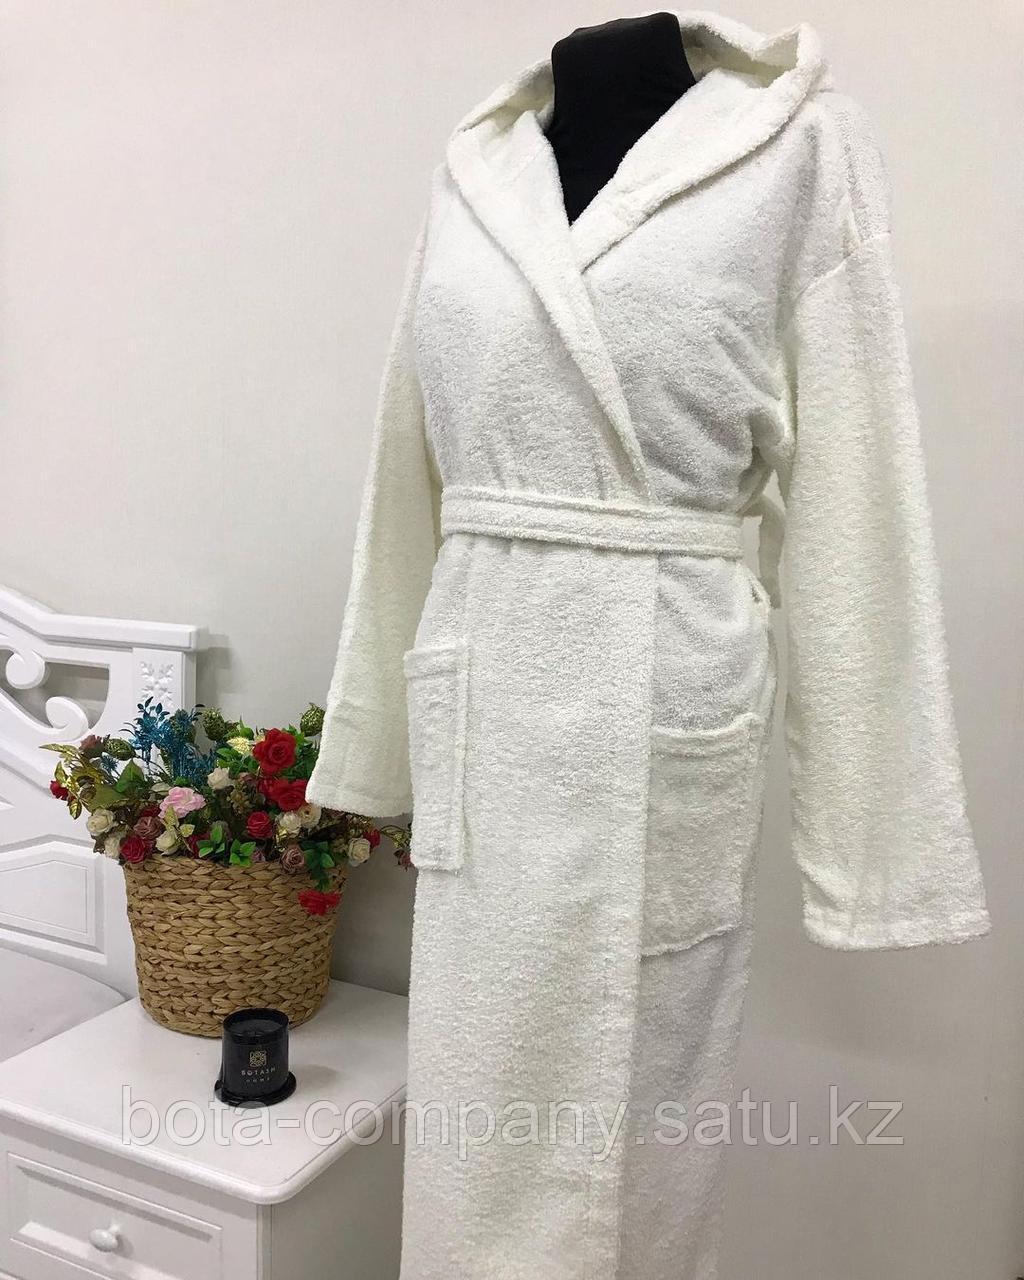 Банный белый халат